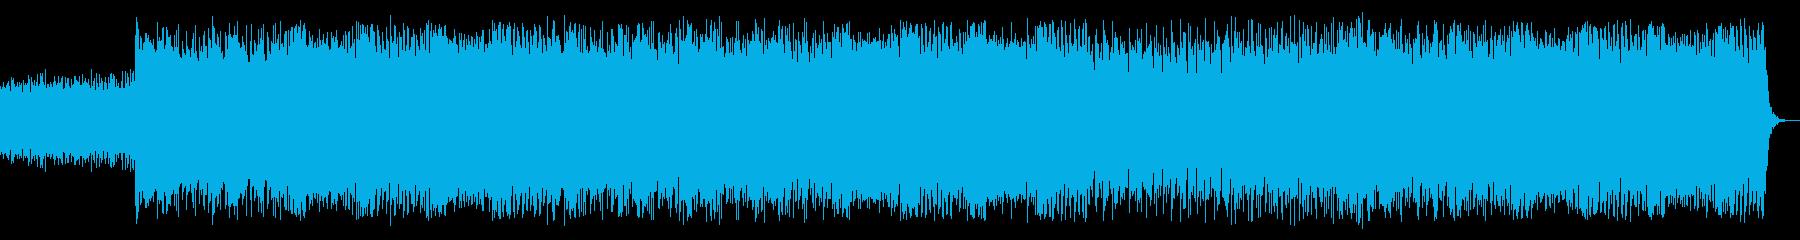 EDM近未来ダークエレクトロダンスビートの再生済みの波形